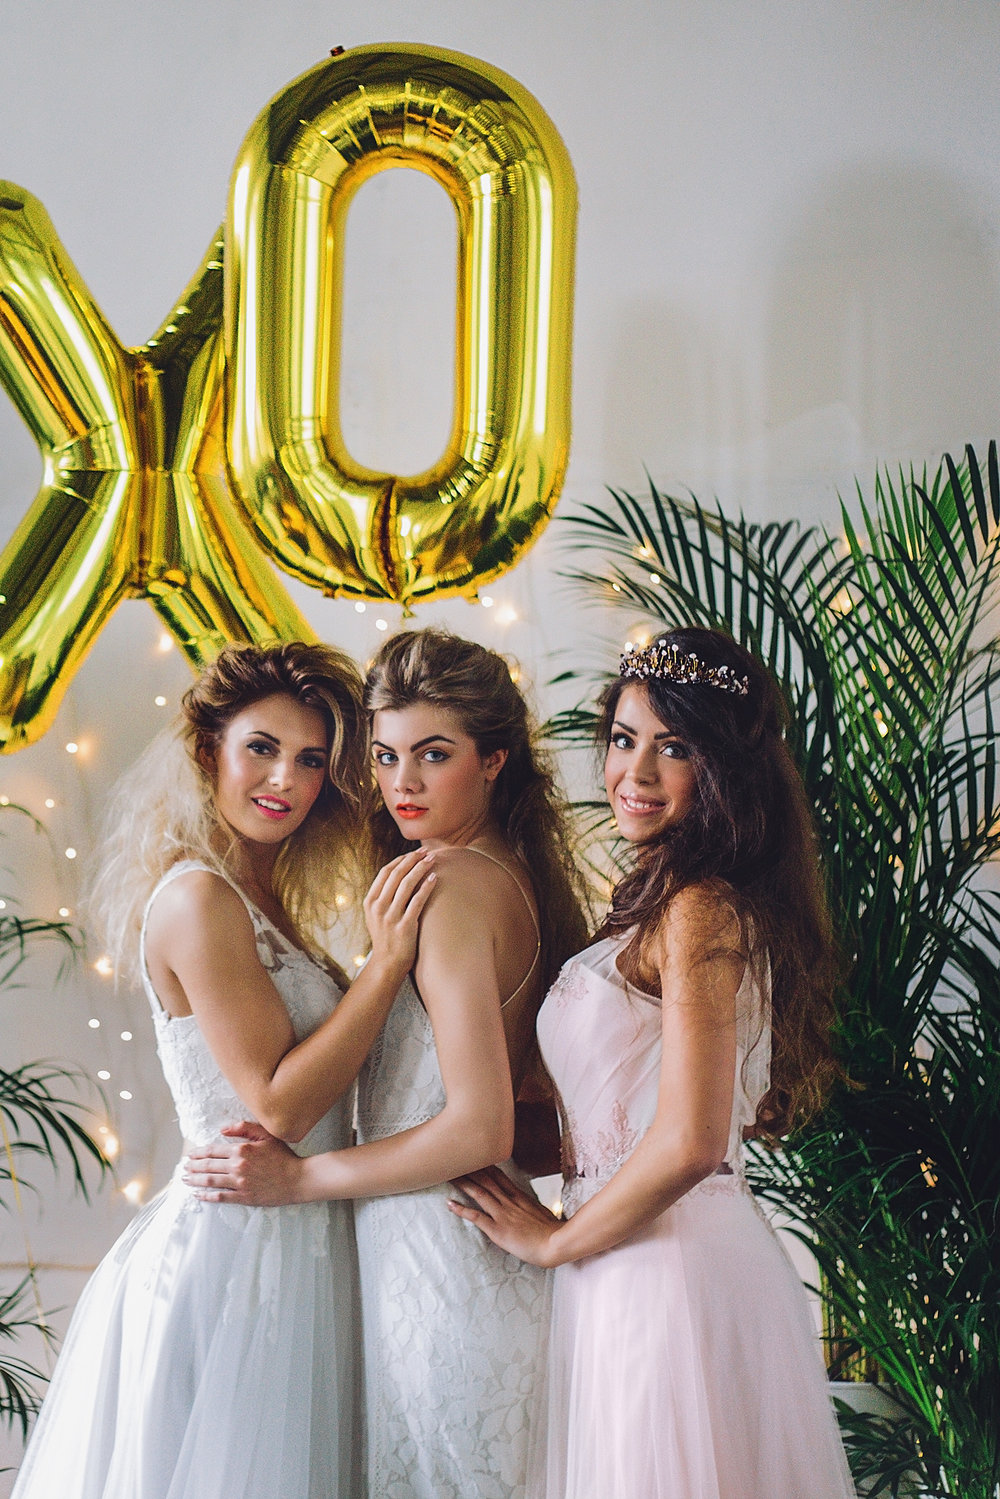 wedding_photographer_norfolk_norwich_kings_lynn (19).jpg